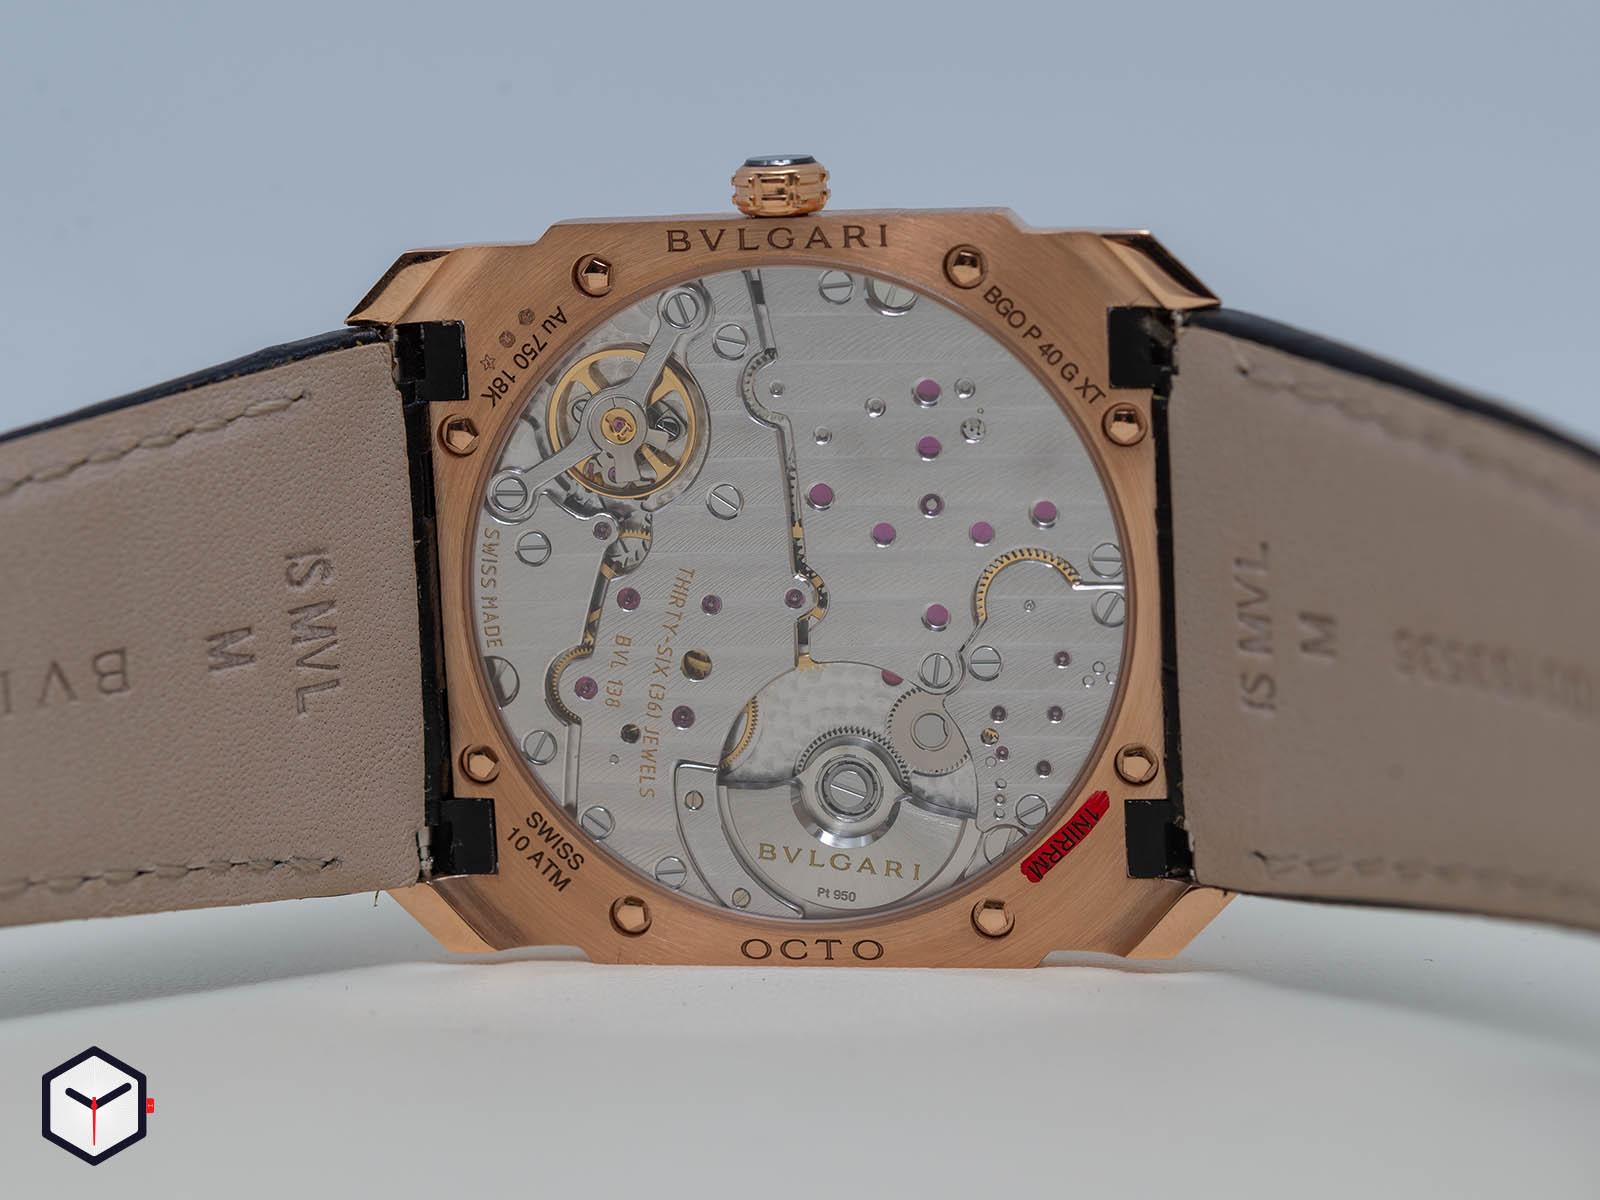 103286-bulgari-octo-finissimo-automatic-5.jpg